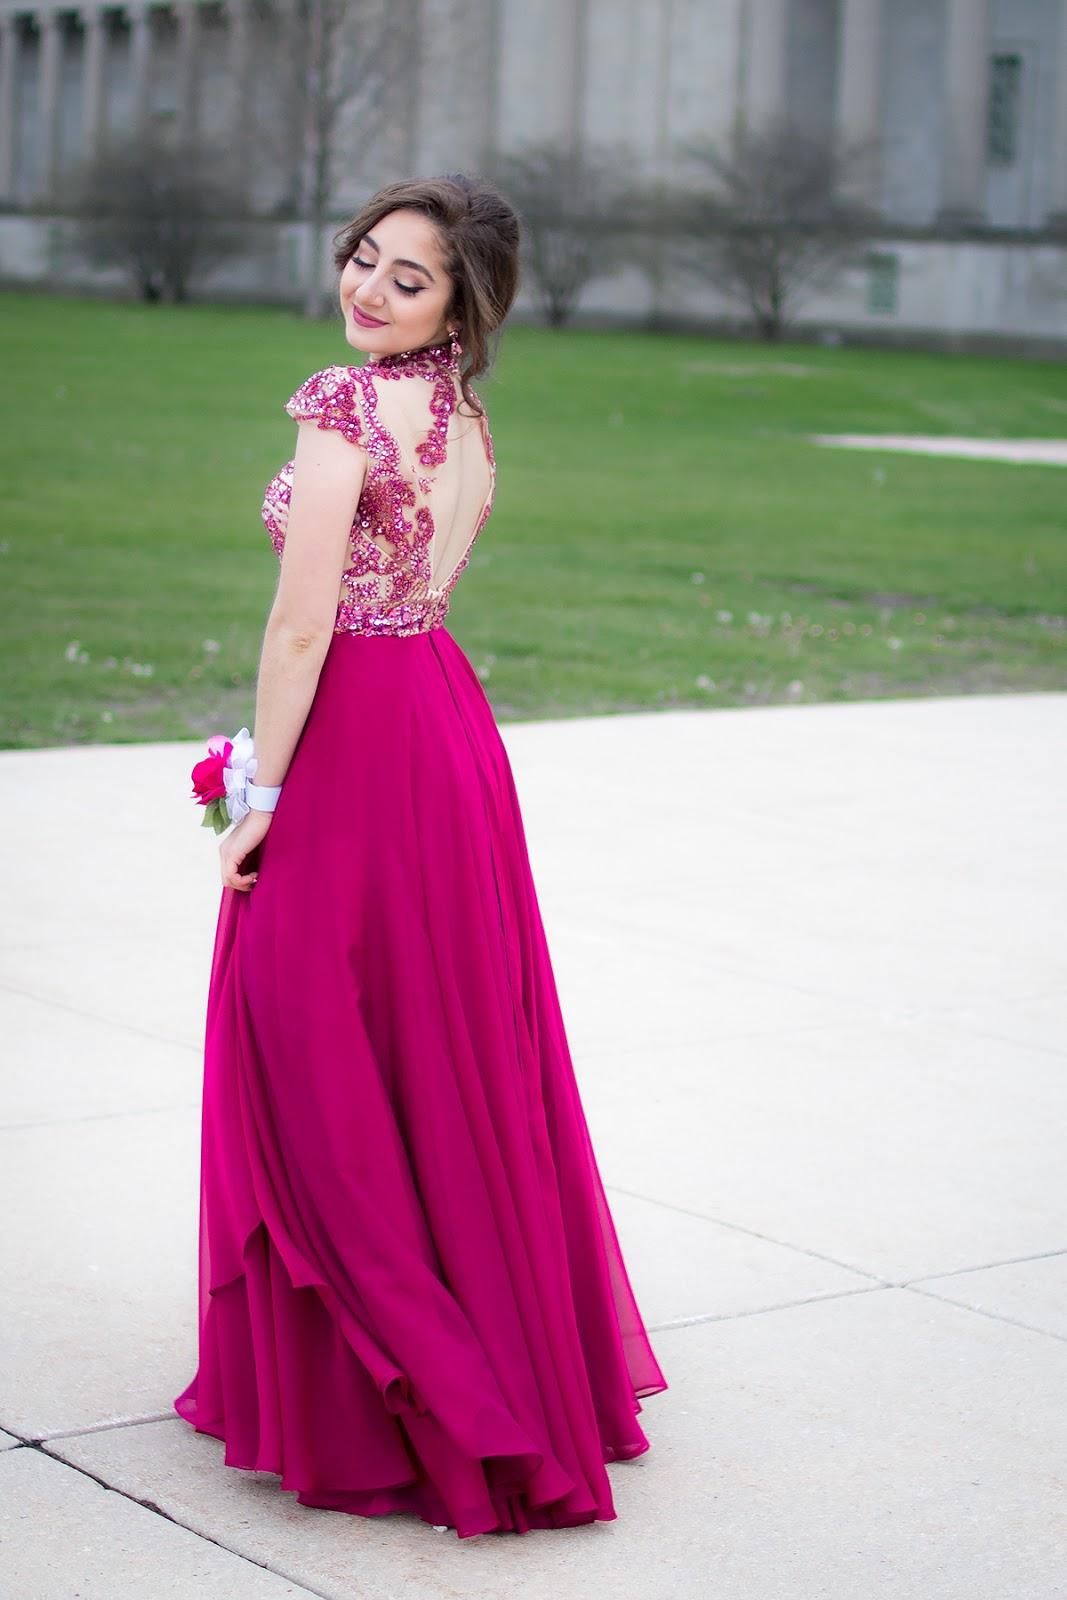 The Longest Prom Dresses